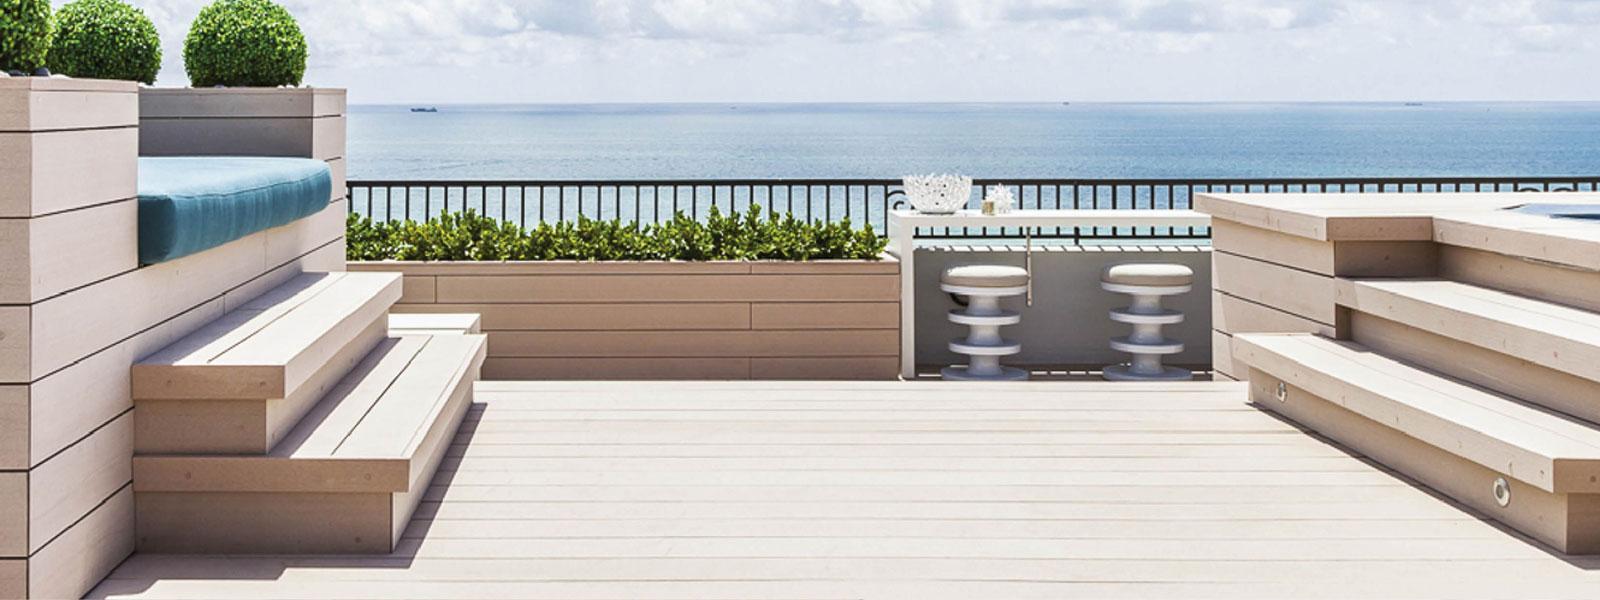 besser als holz wpc wasserfeste produkte design aus resysta. Black Bedroom Furniture Sets. Home Design Ideas